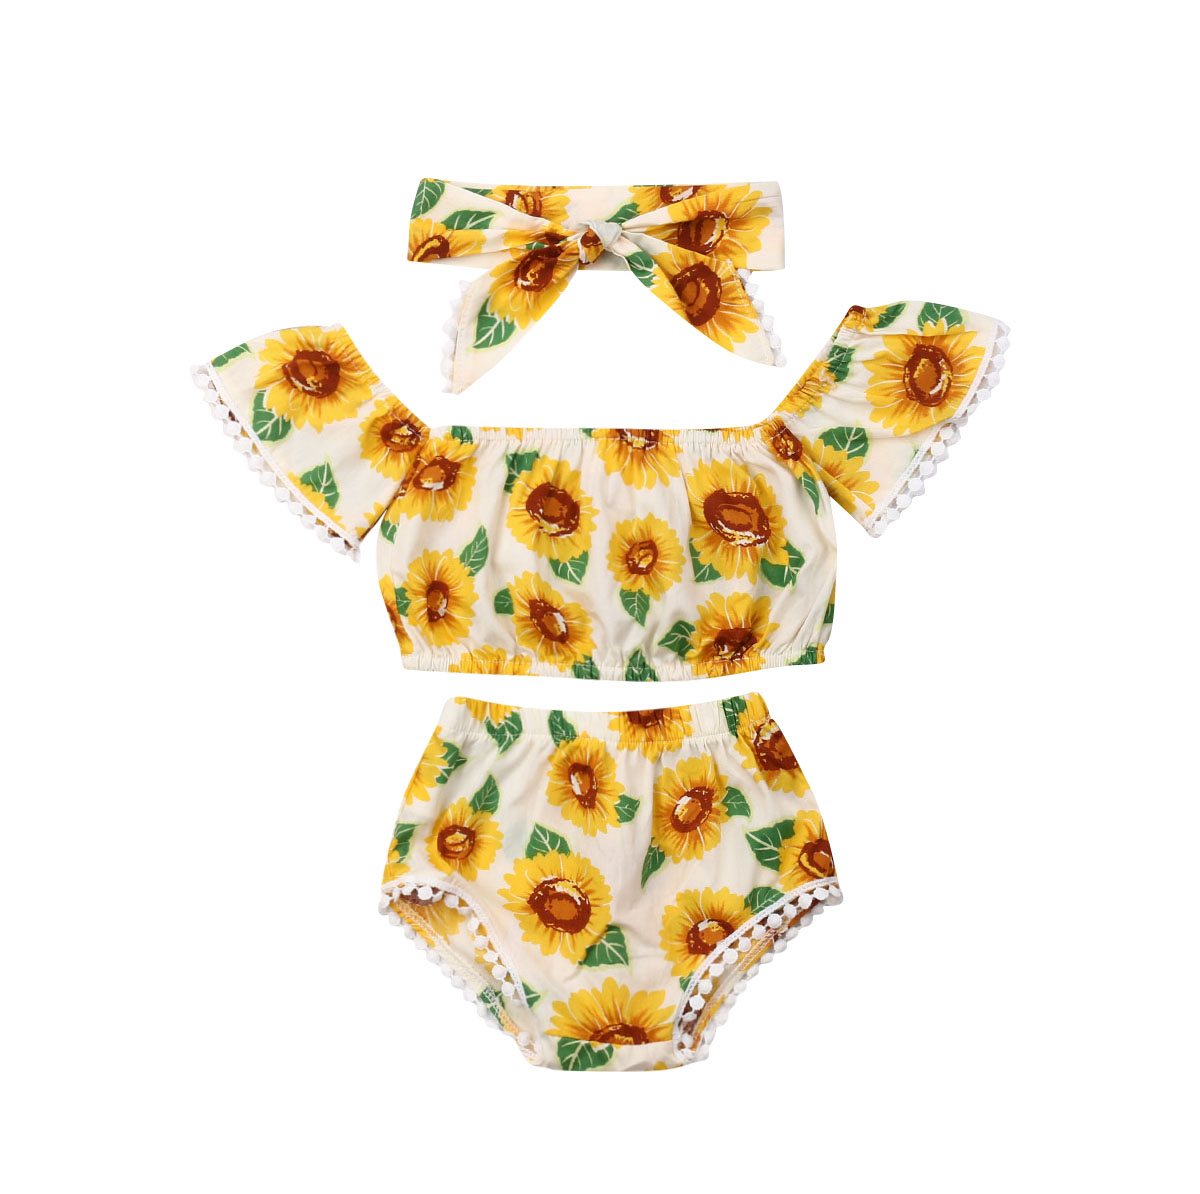 0-18 M Neugeborenen Baby Mädchen Sunflower Kleidung Off Schulter Quaste Ball Crop Tops Pumphose Shorts Stirnband 3 Pcs Baby Kleidung Set